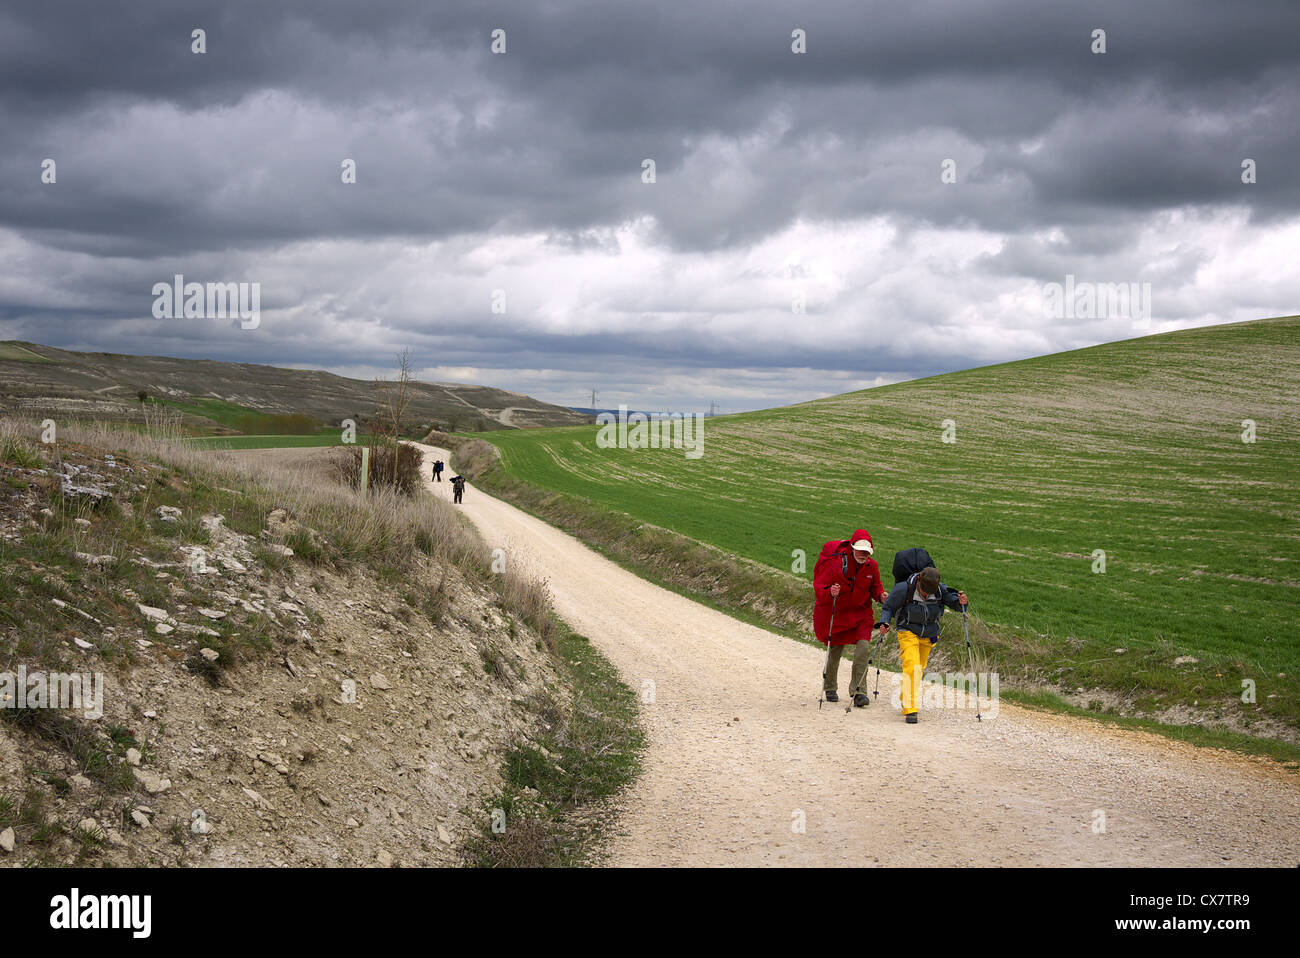 Pilgrims walking the camino to Santiago in Castilla y Leon, Spain. - Stock Image